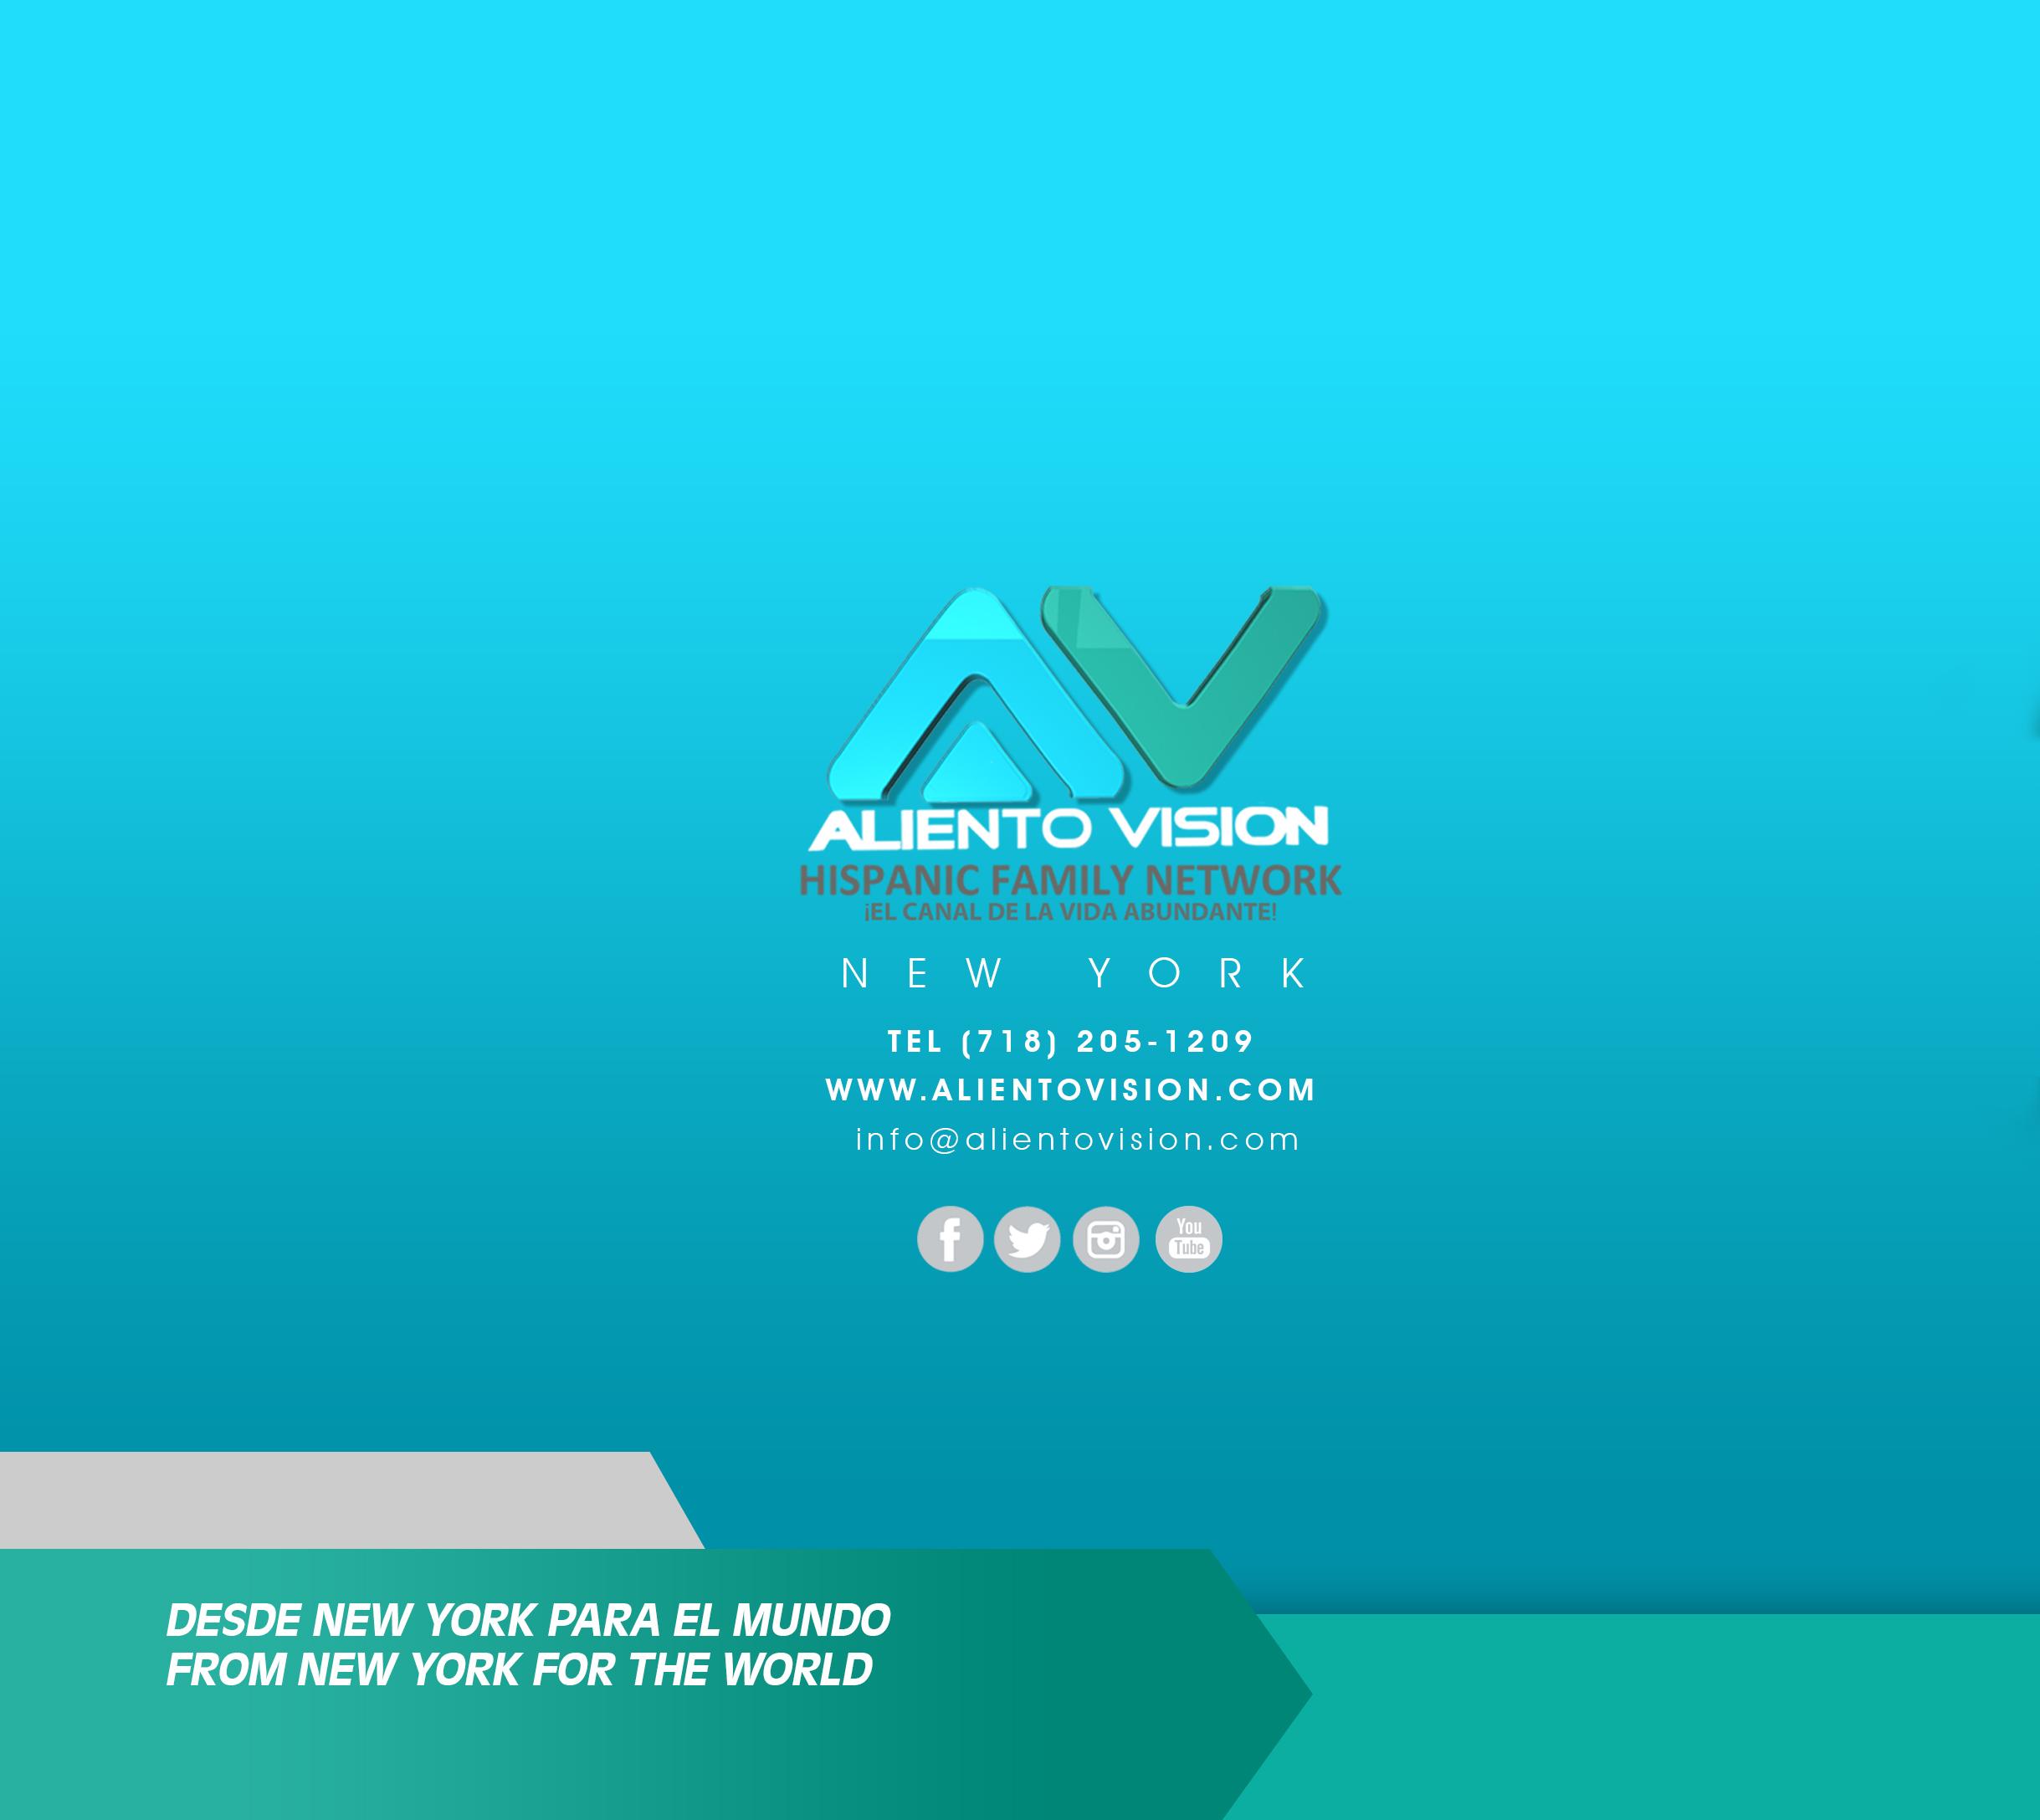 MEDIA KIT ALIENTO VISION 24.jpg